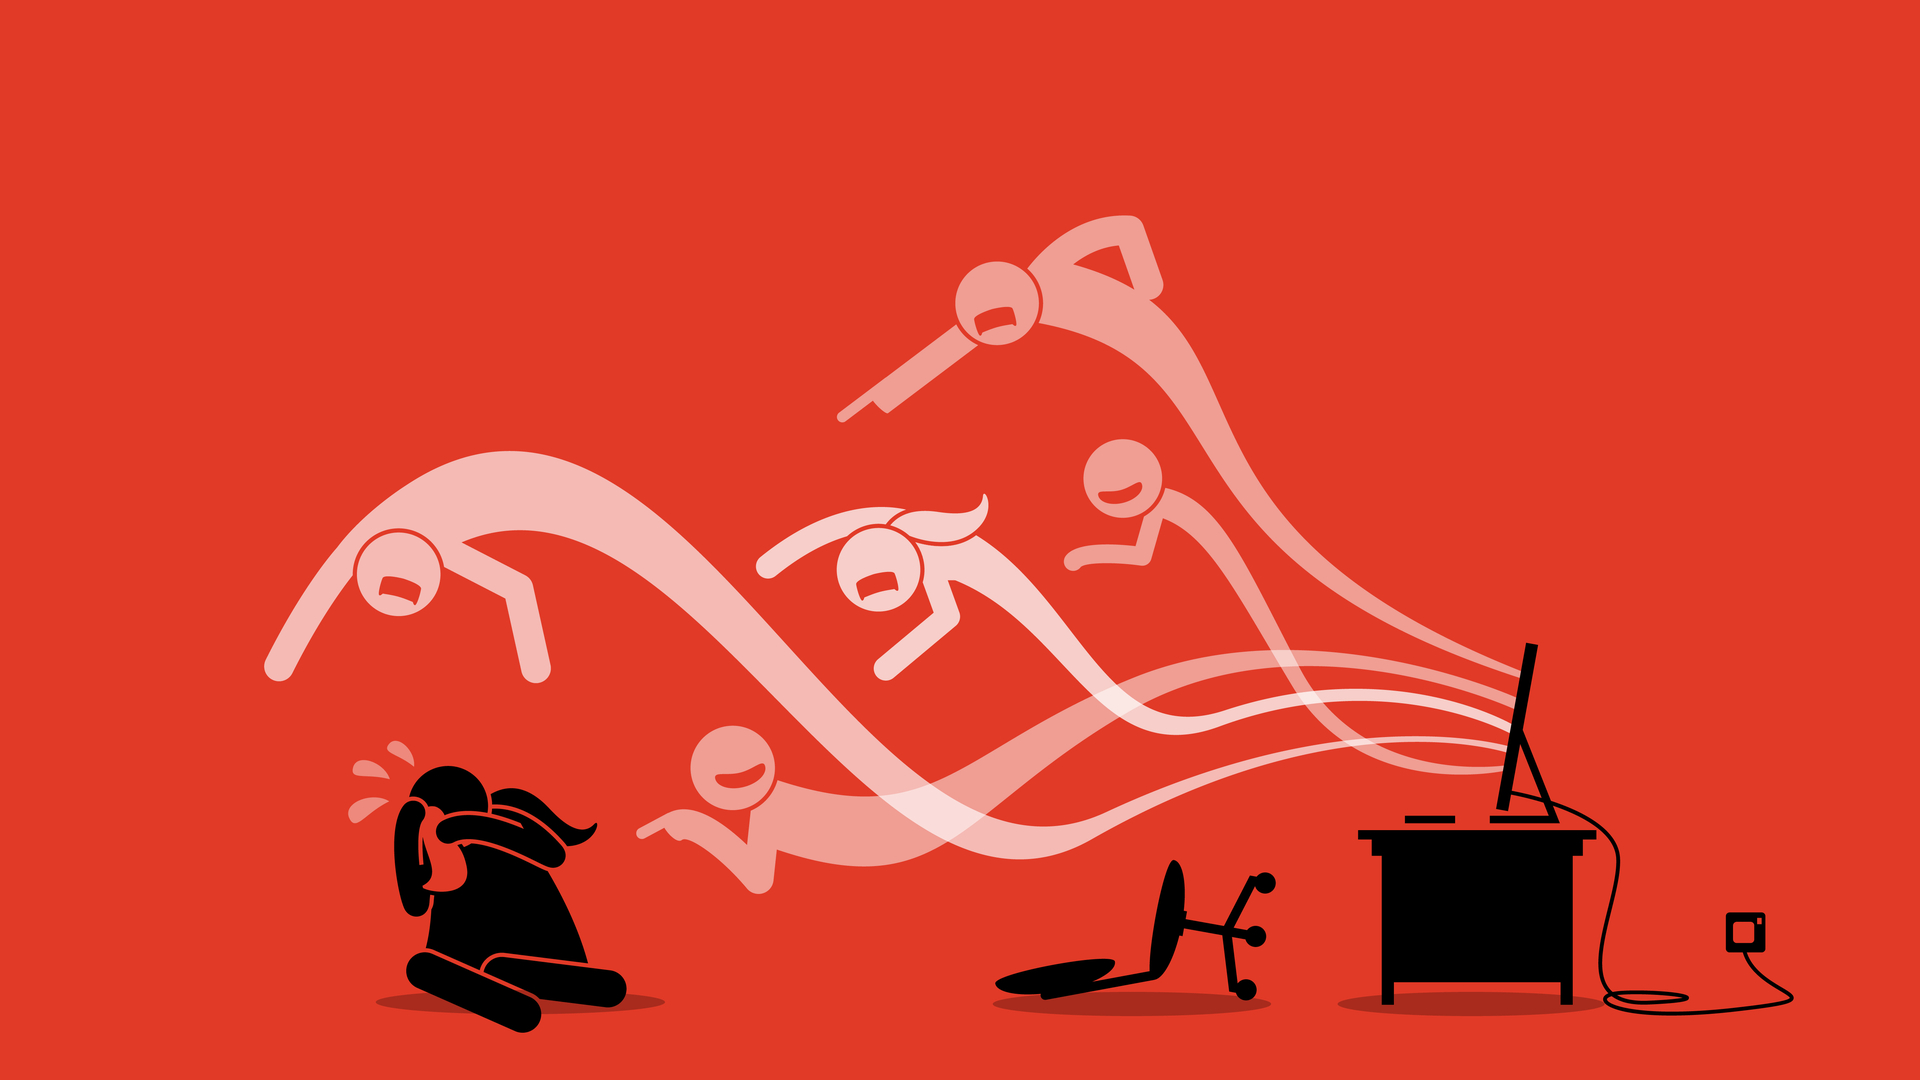 illustration of cyber bullying